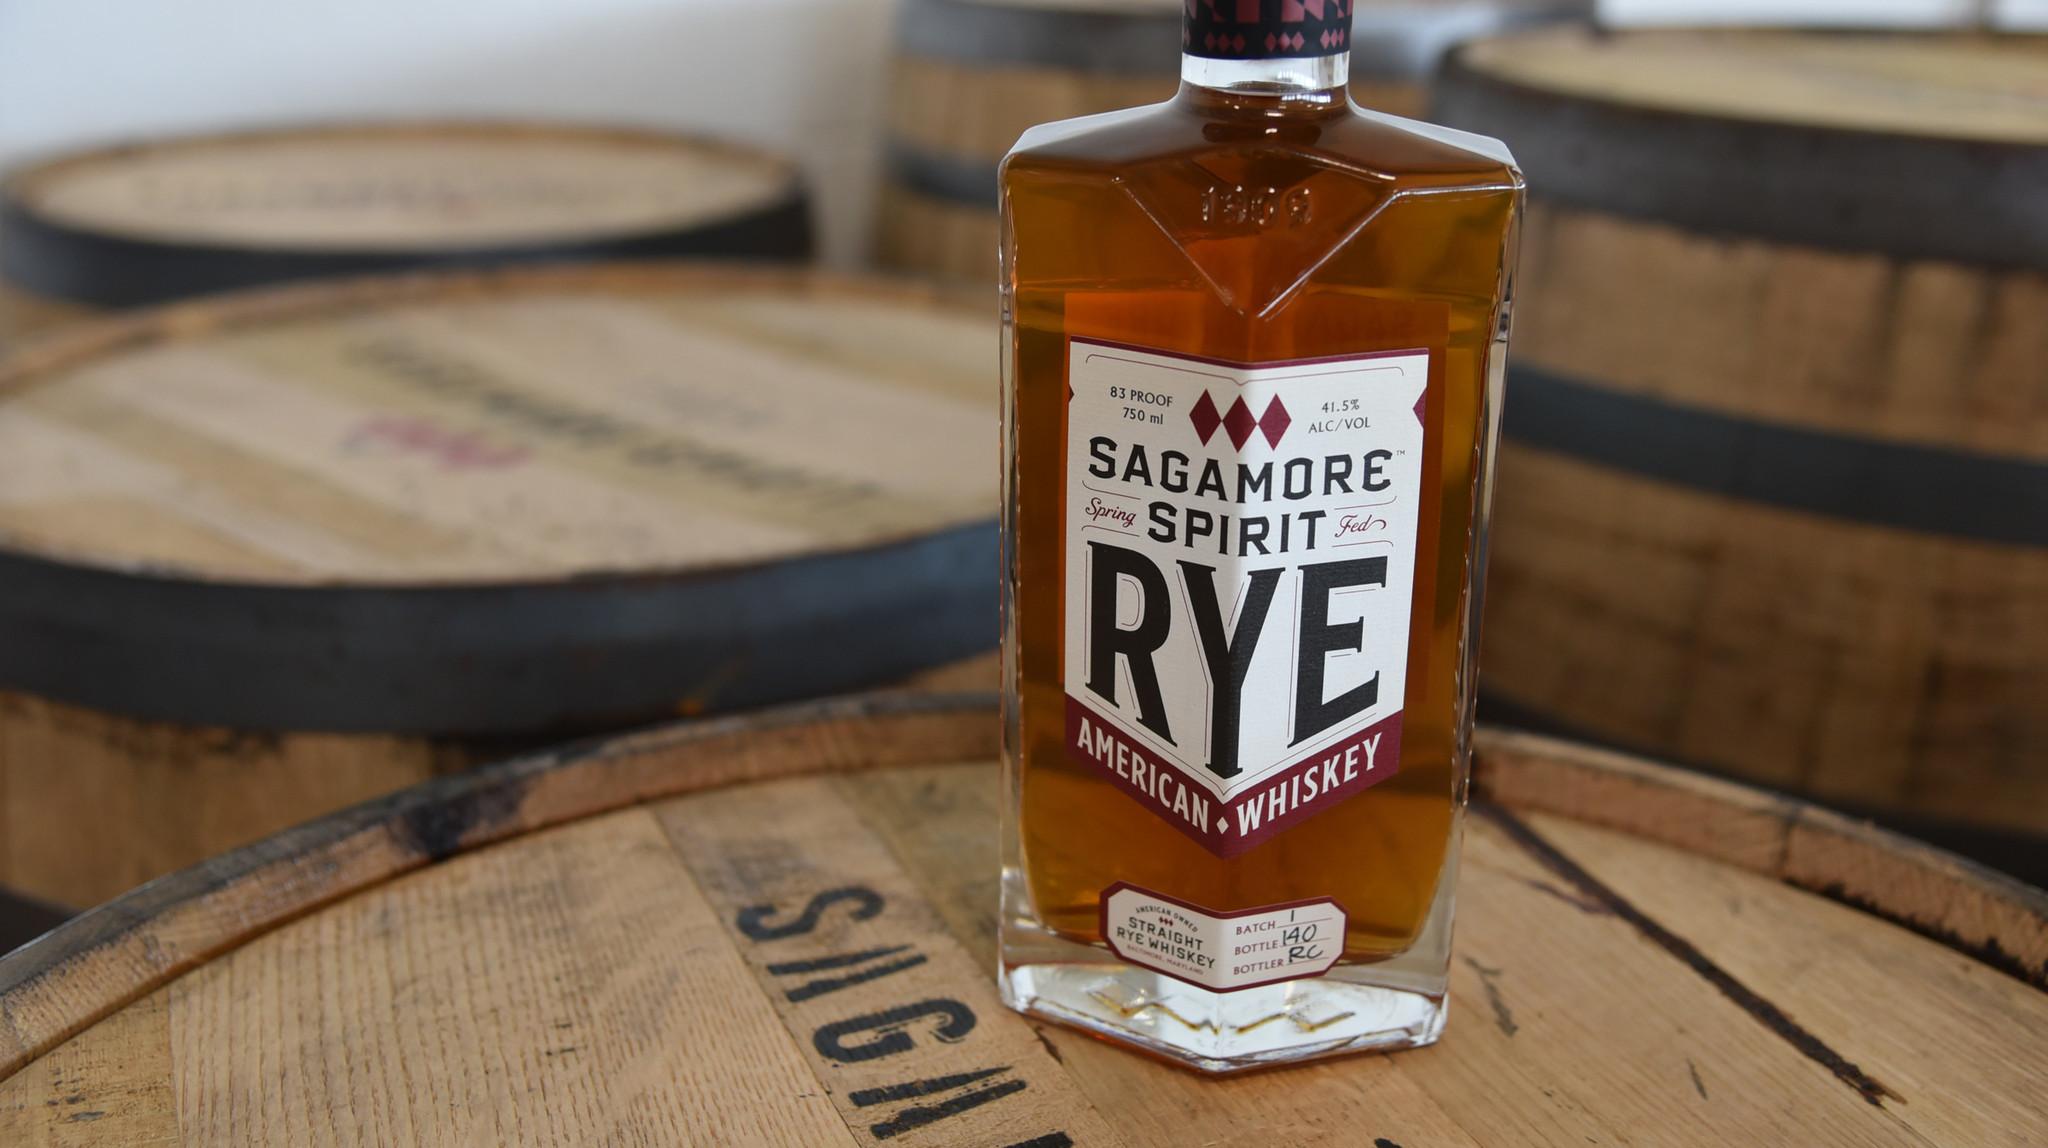 Kevin Planks Sagamore Spirit rye whiskey to hit shelves